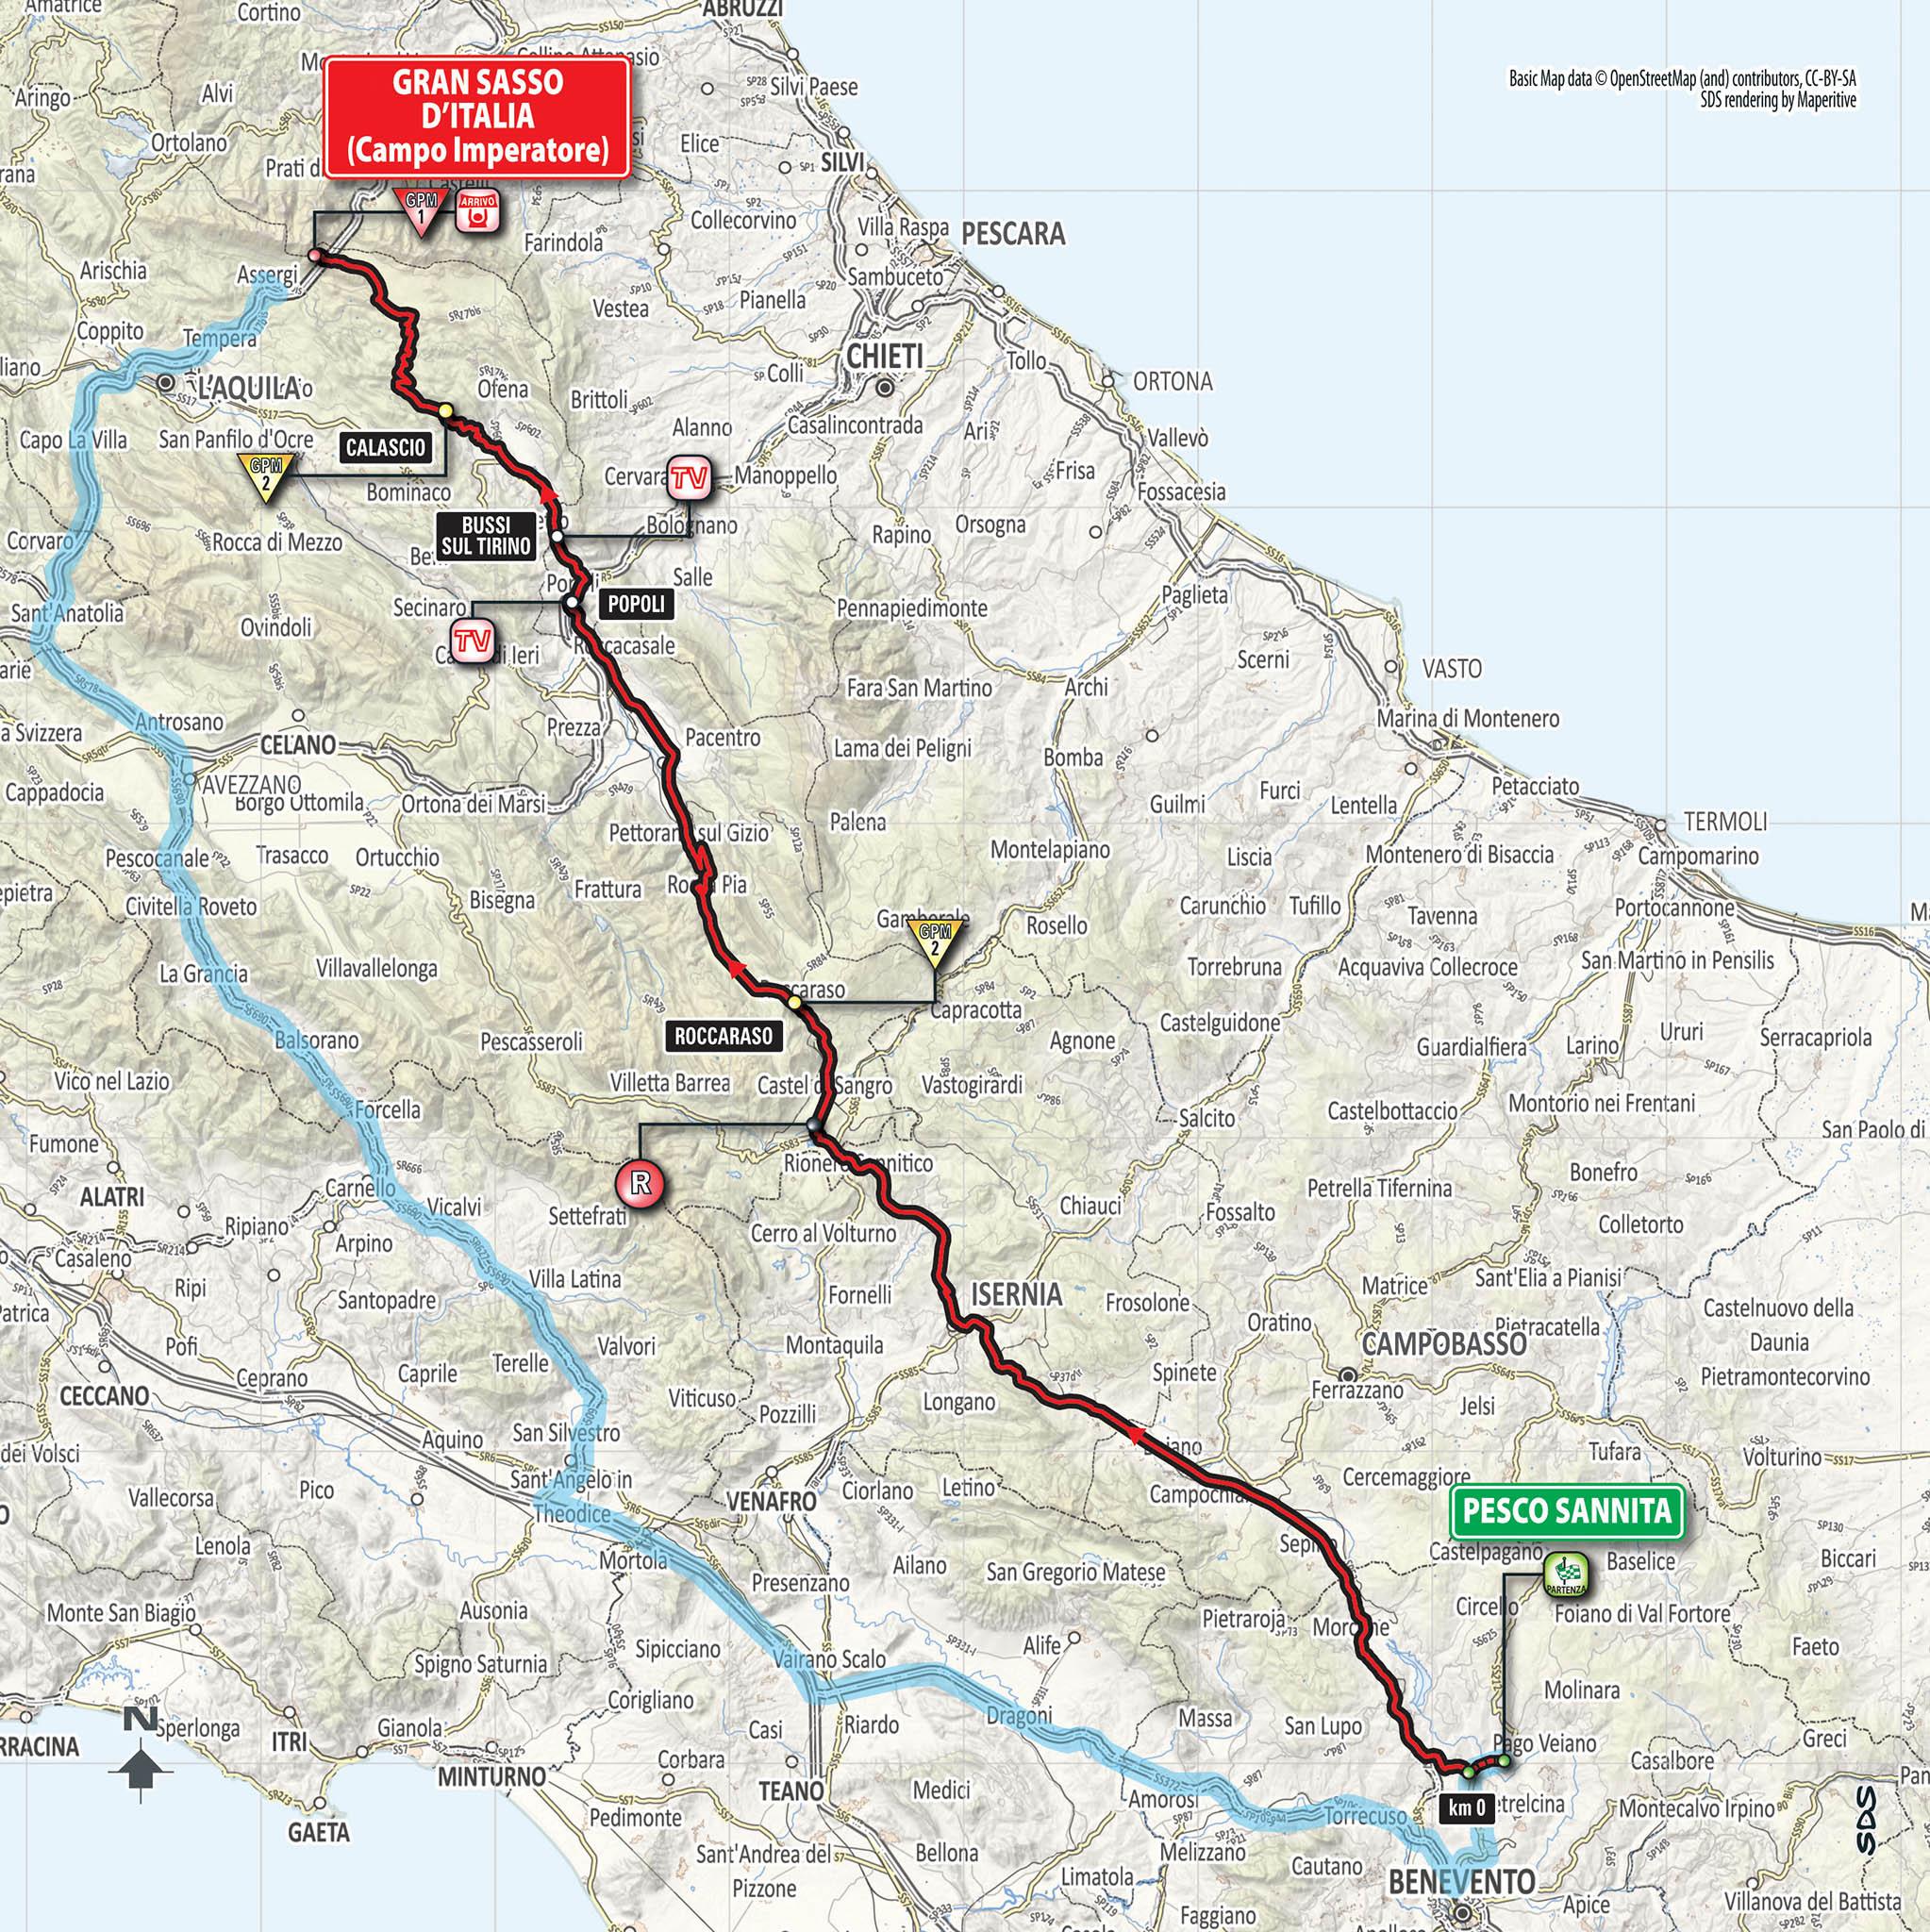 Parcours étape 9 Giro 2018